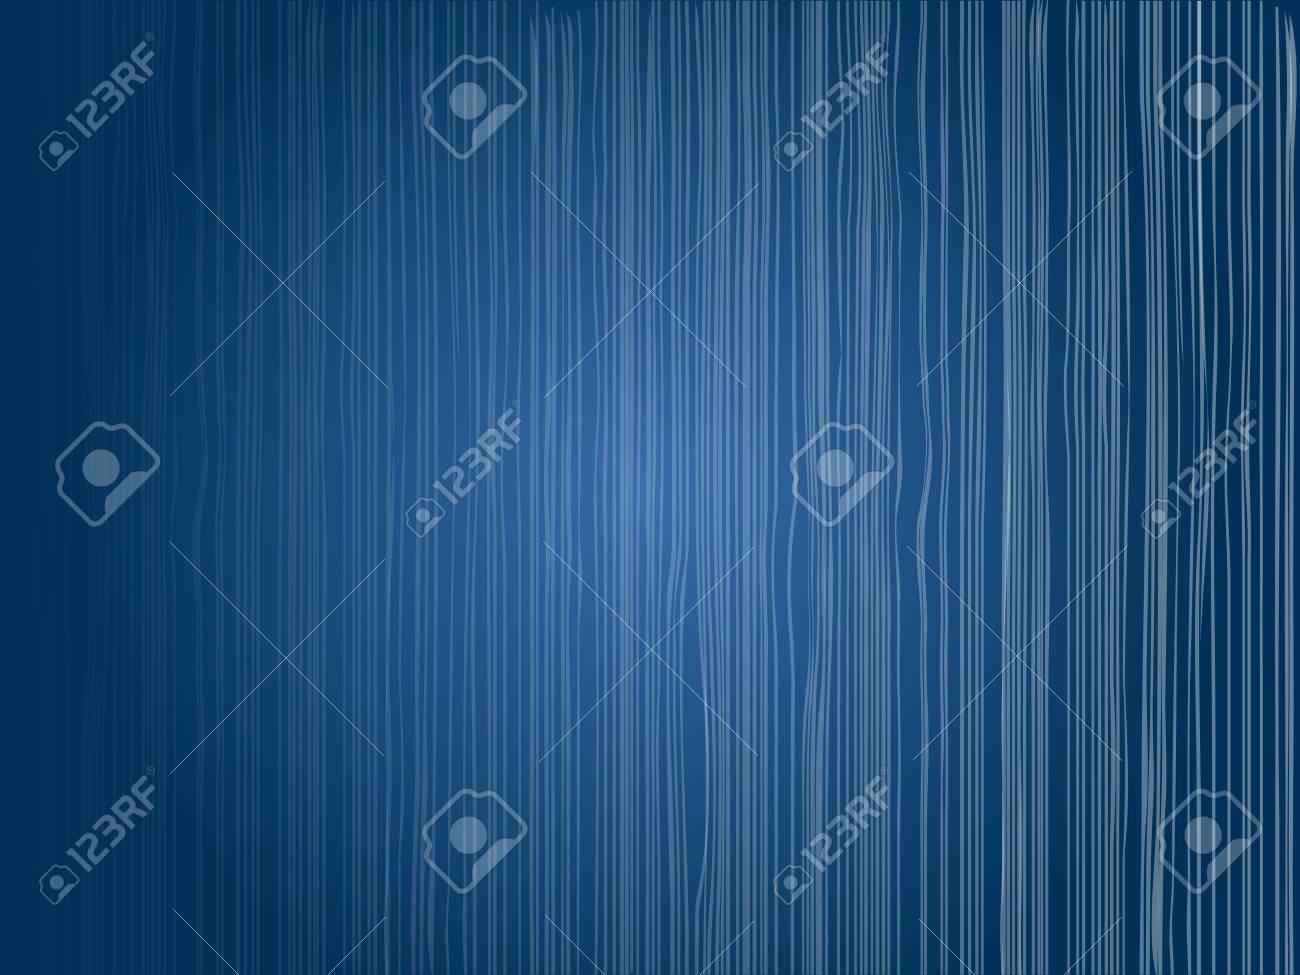 Illustration of wiggly vertical lines on blue. - 9757253